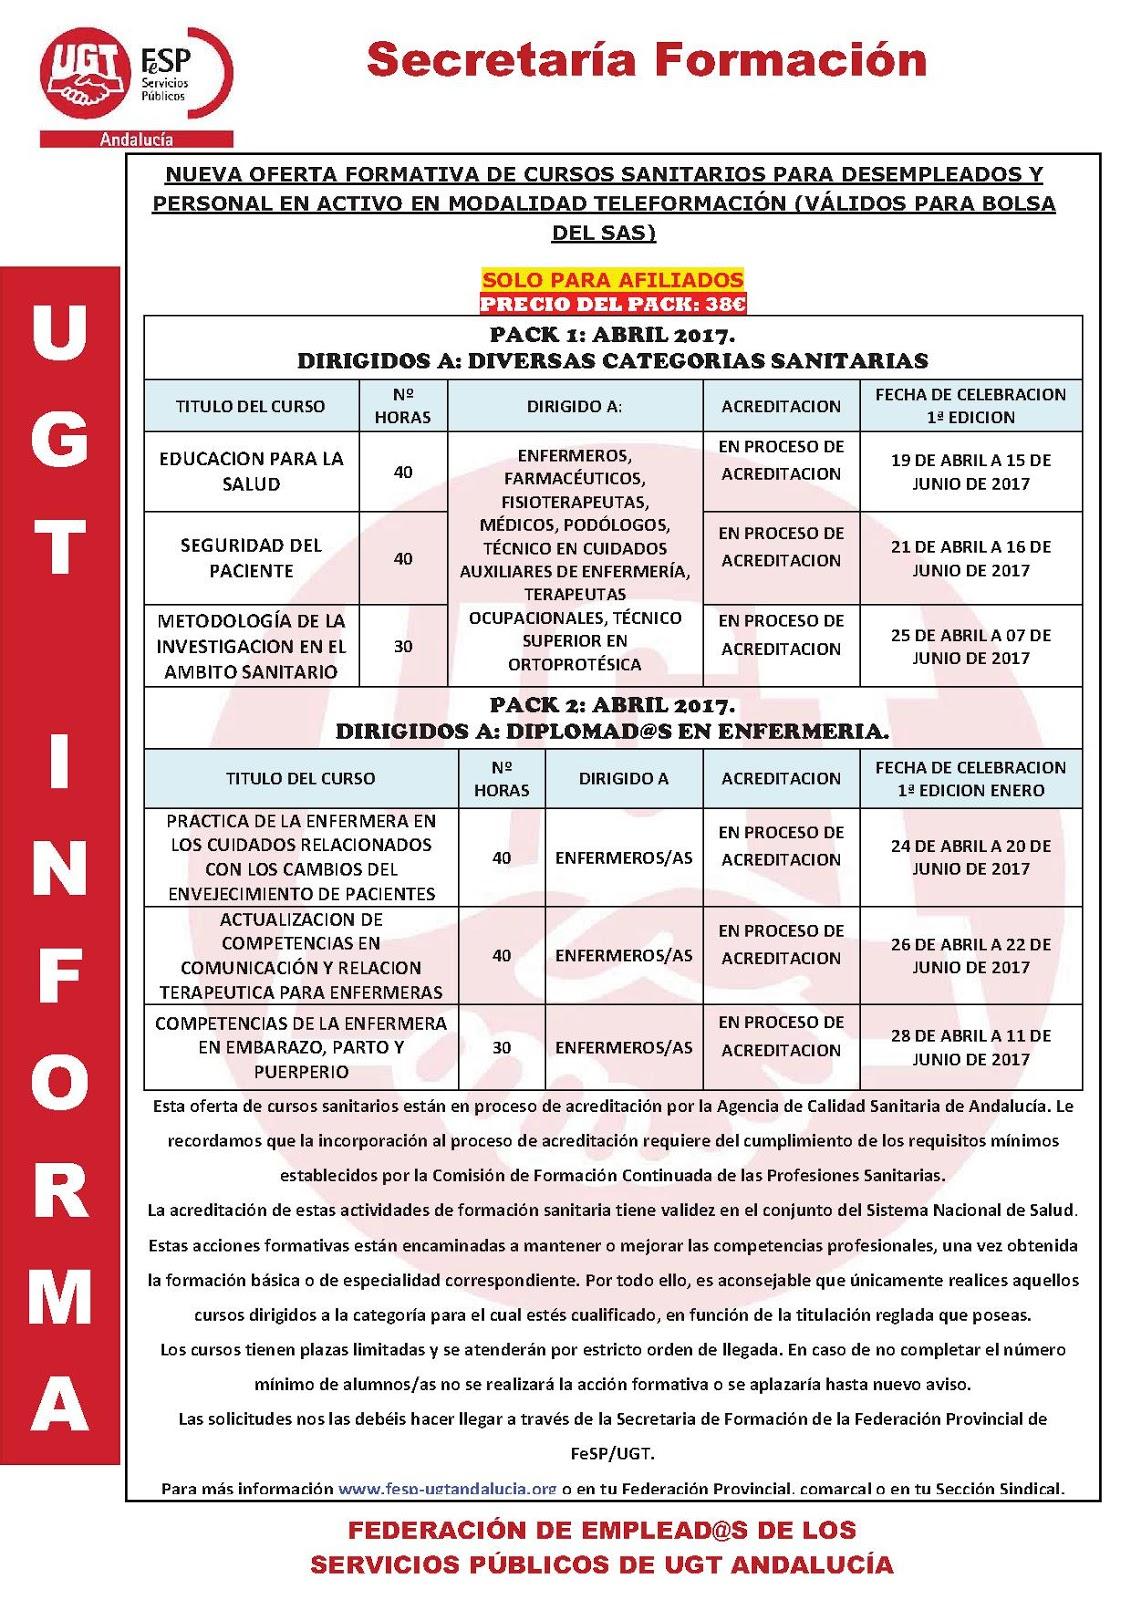 ugt hospital regional malaga oferta cursos sanitarios